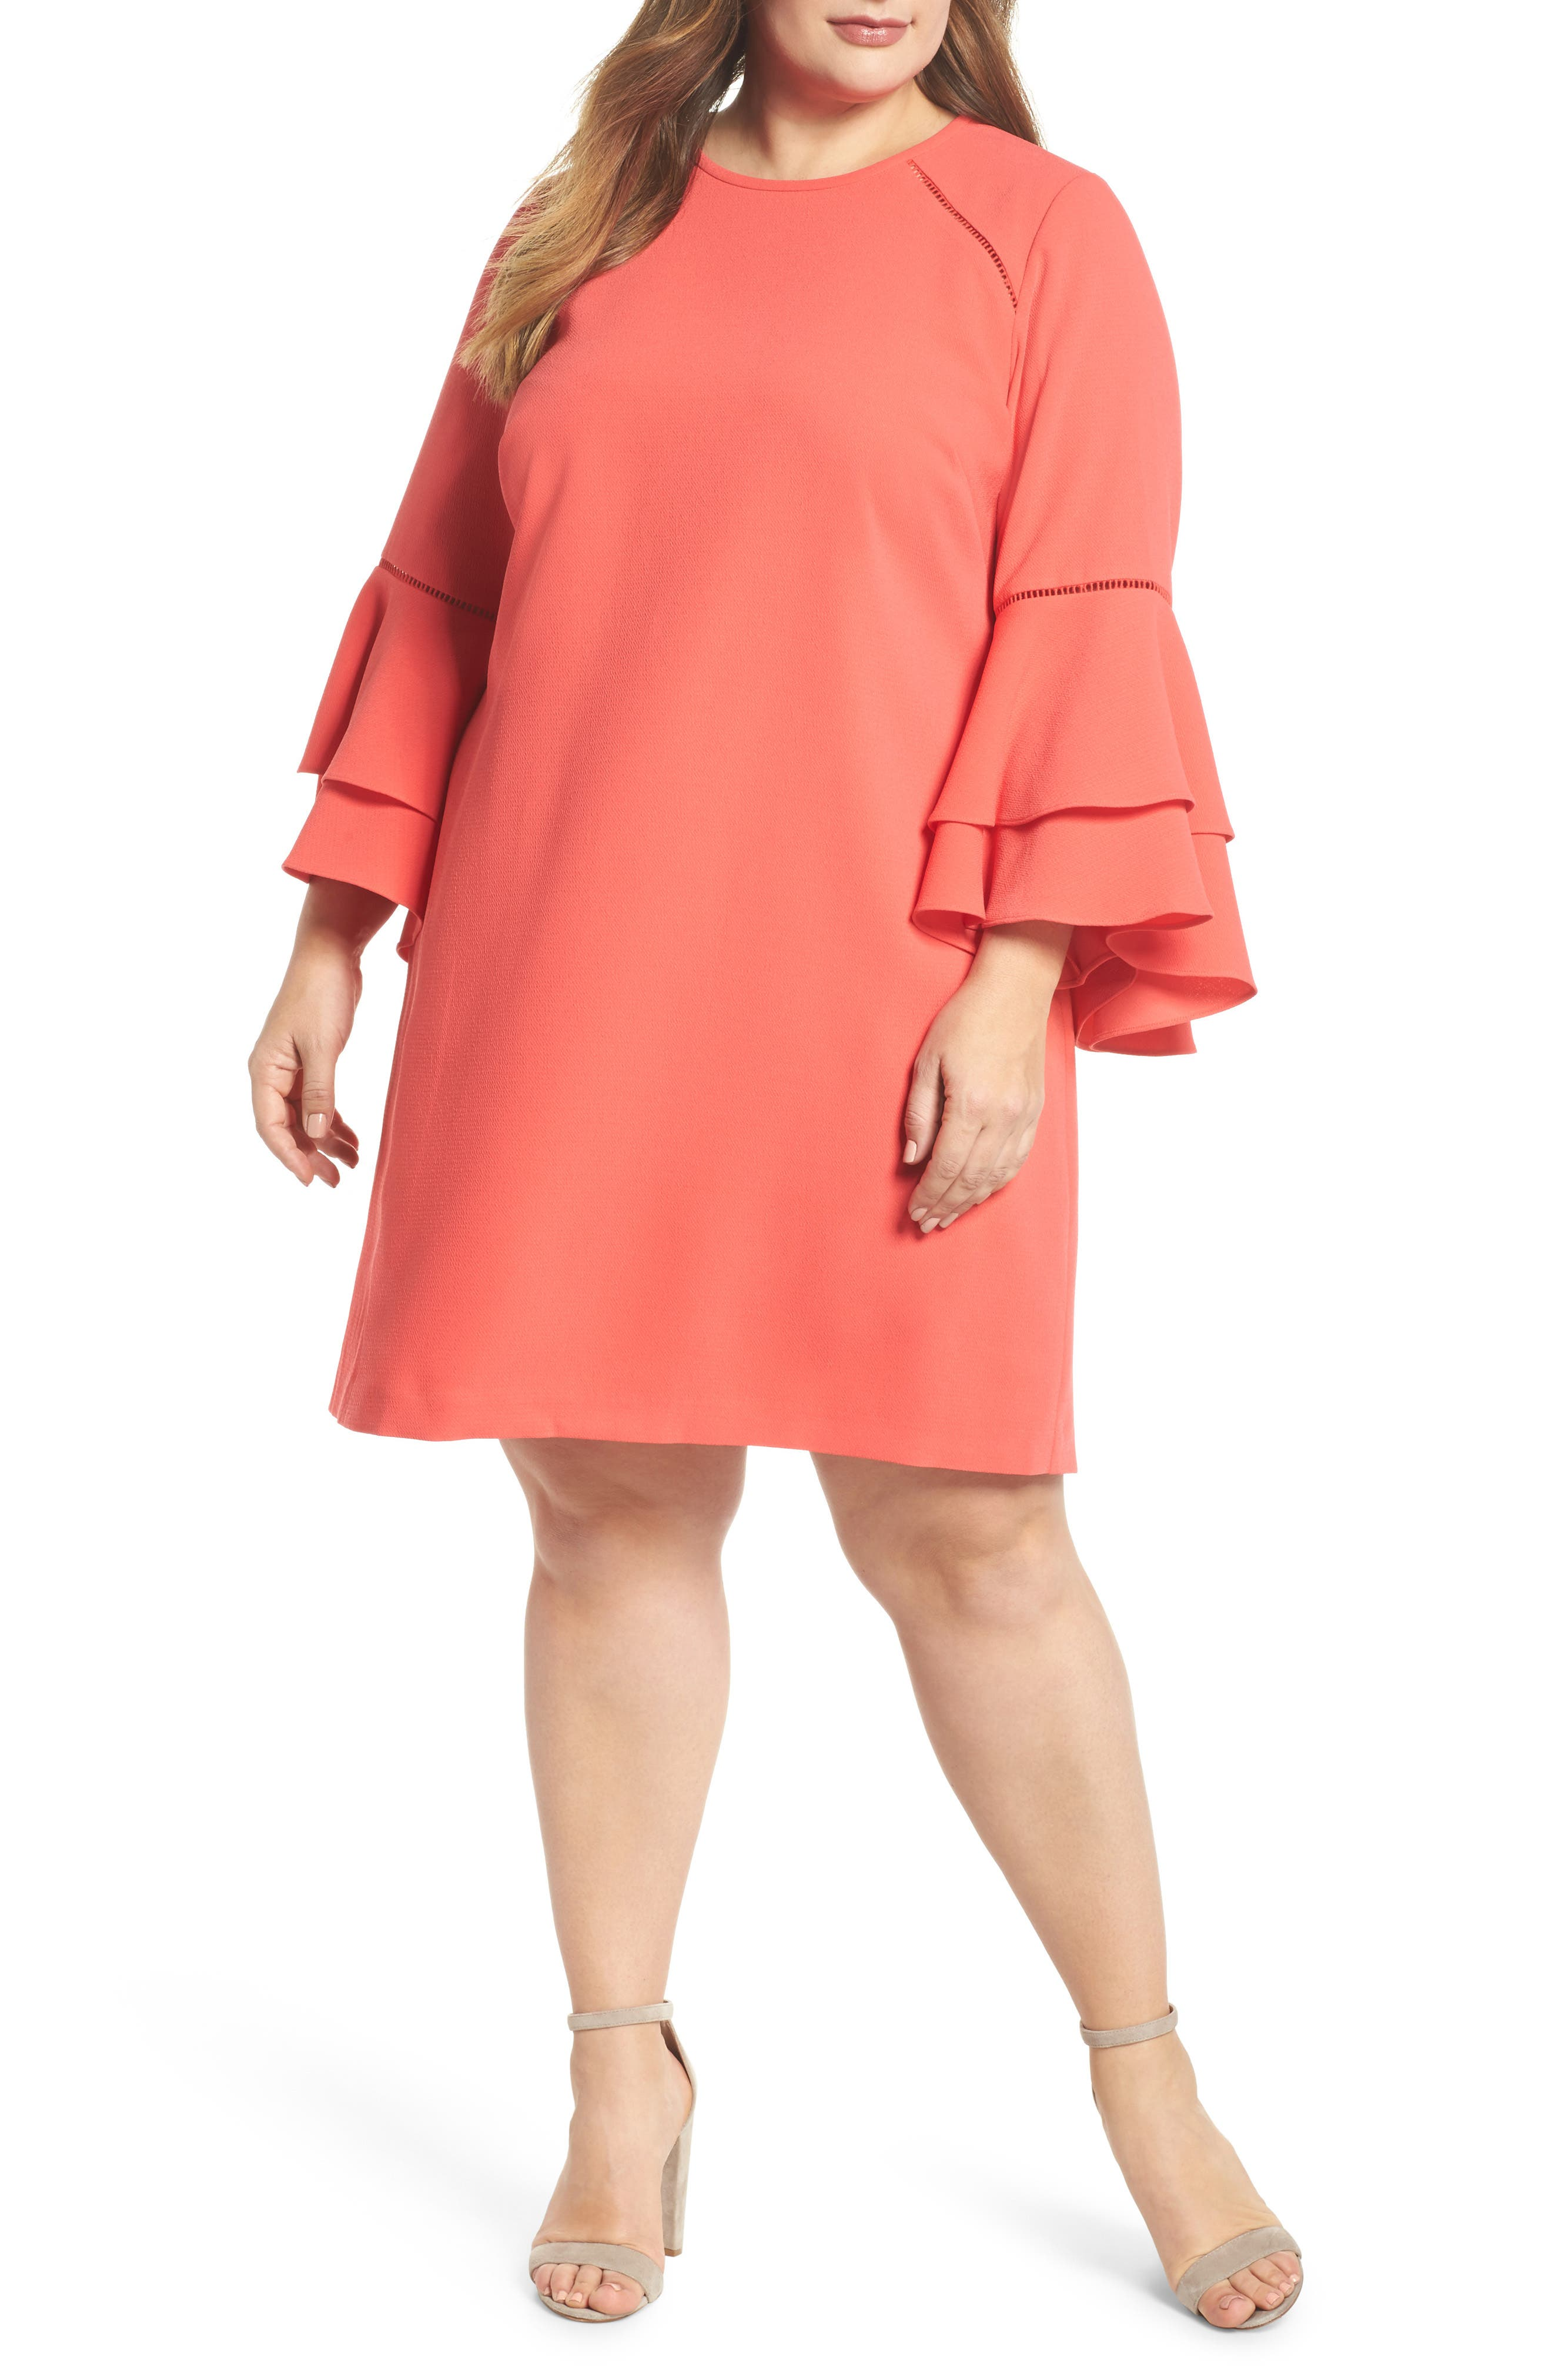 Main Image - Chelsea28 Ruffle Bell Sleeve Shift Dress (Plus Size)